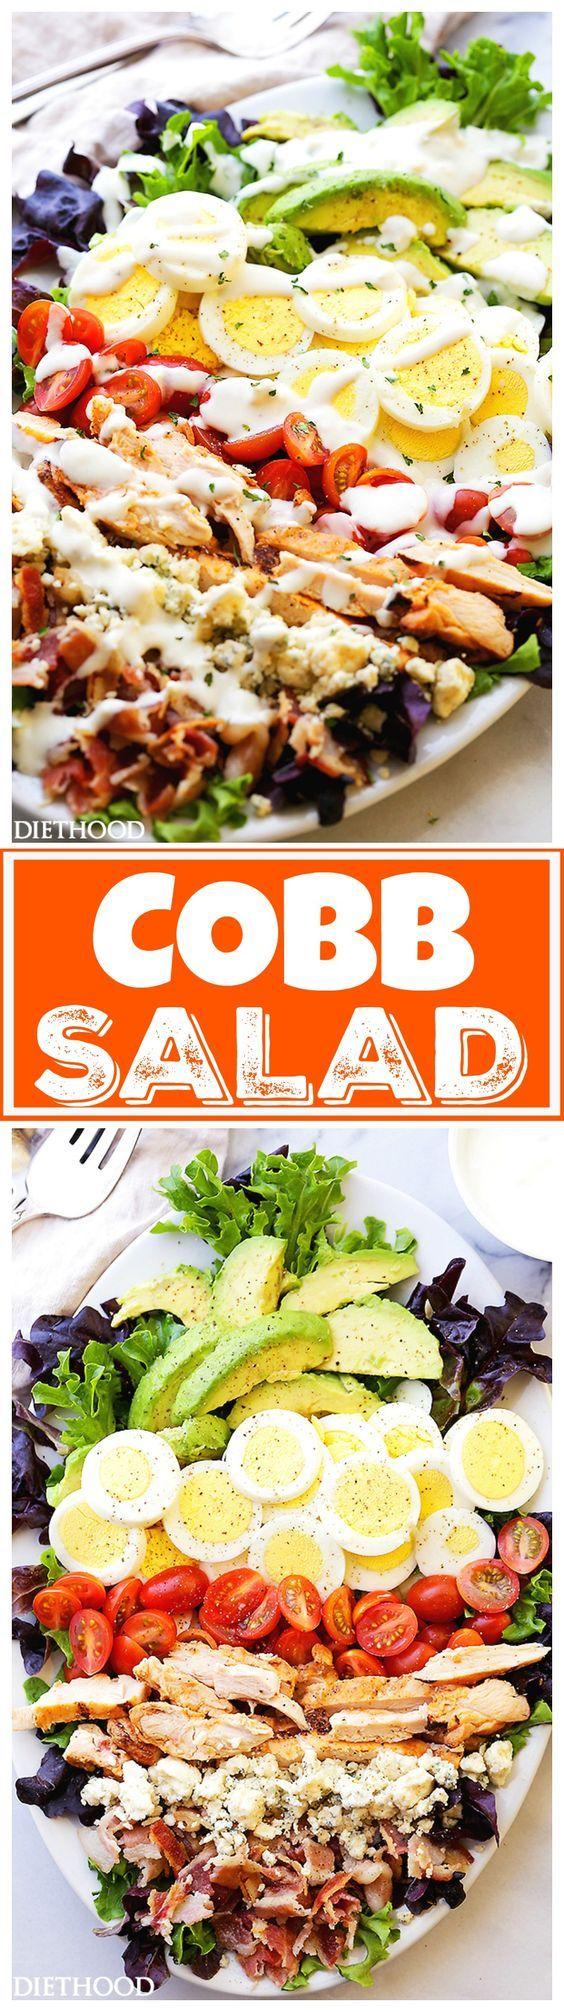 Cobb Salad Recipe via Diethood - This classic American main-dish salad ...